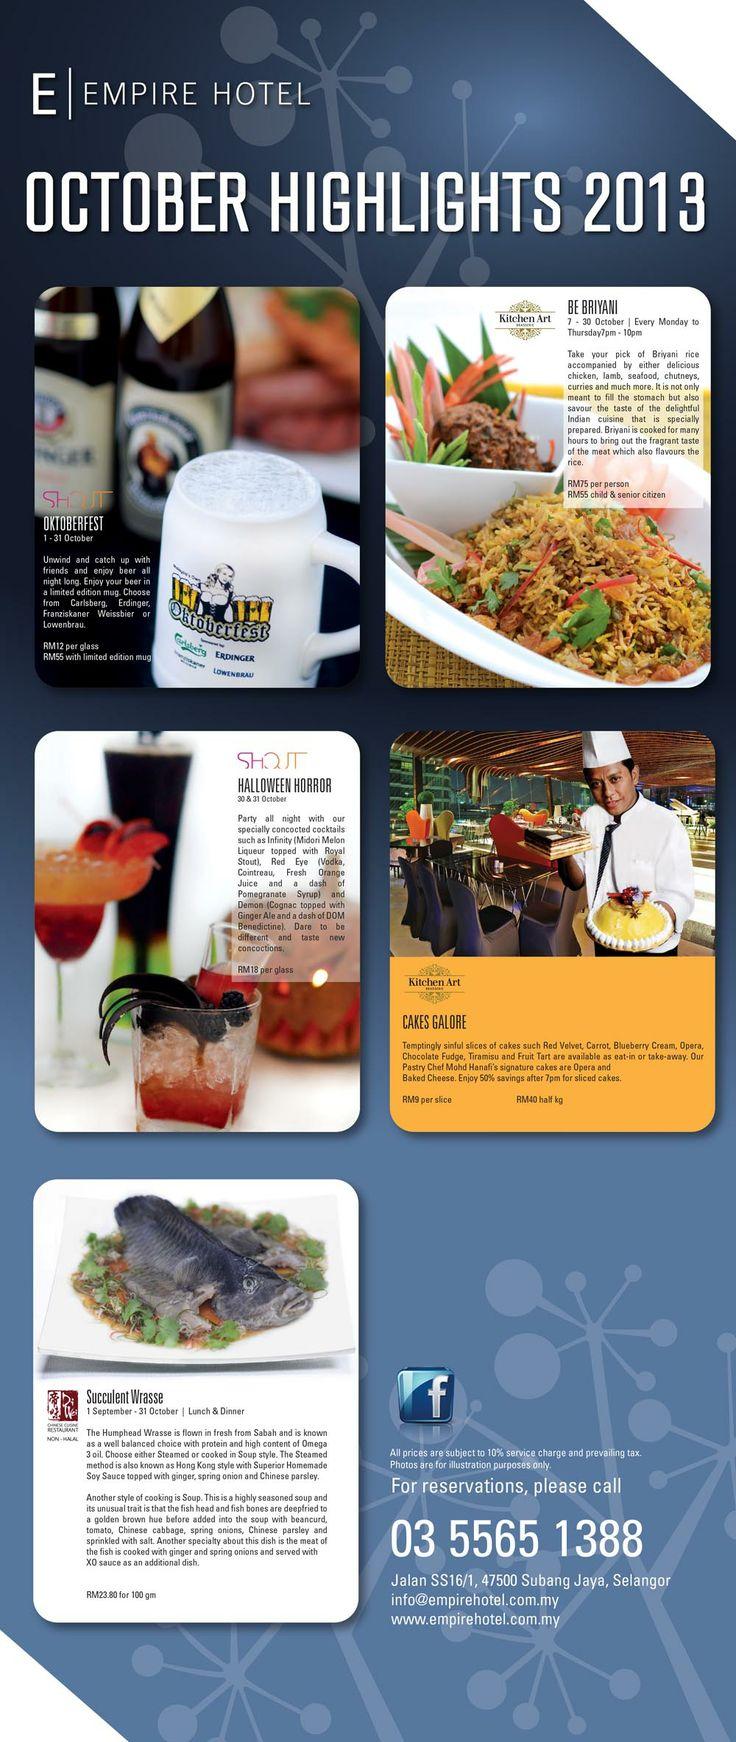 Empire Times Oct 2013 by Empire Hotel Subang  http://www.empirehotel.com.my/kitchen-art.html